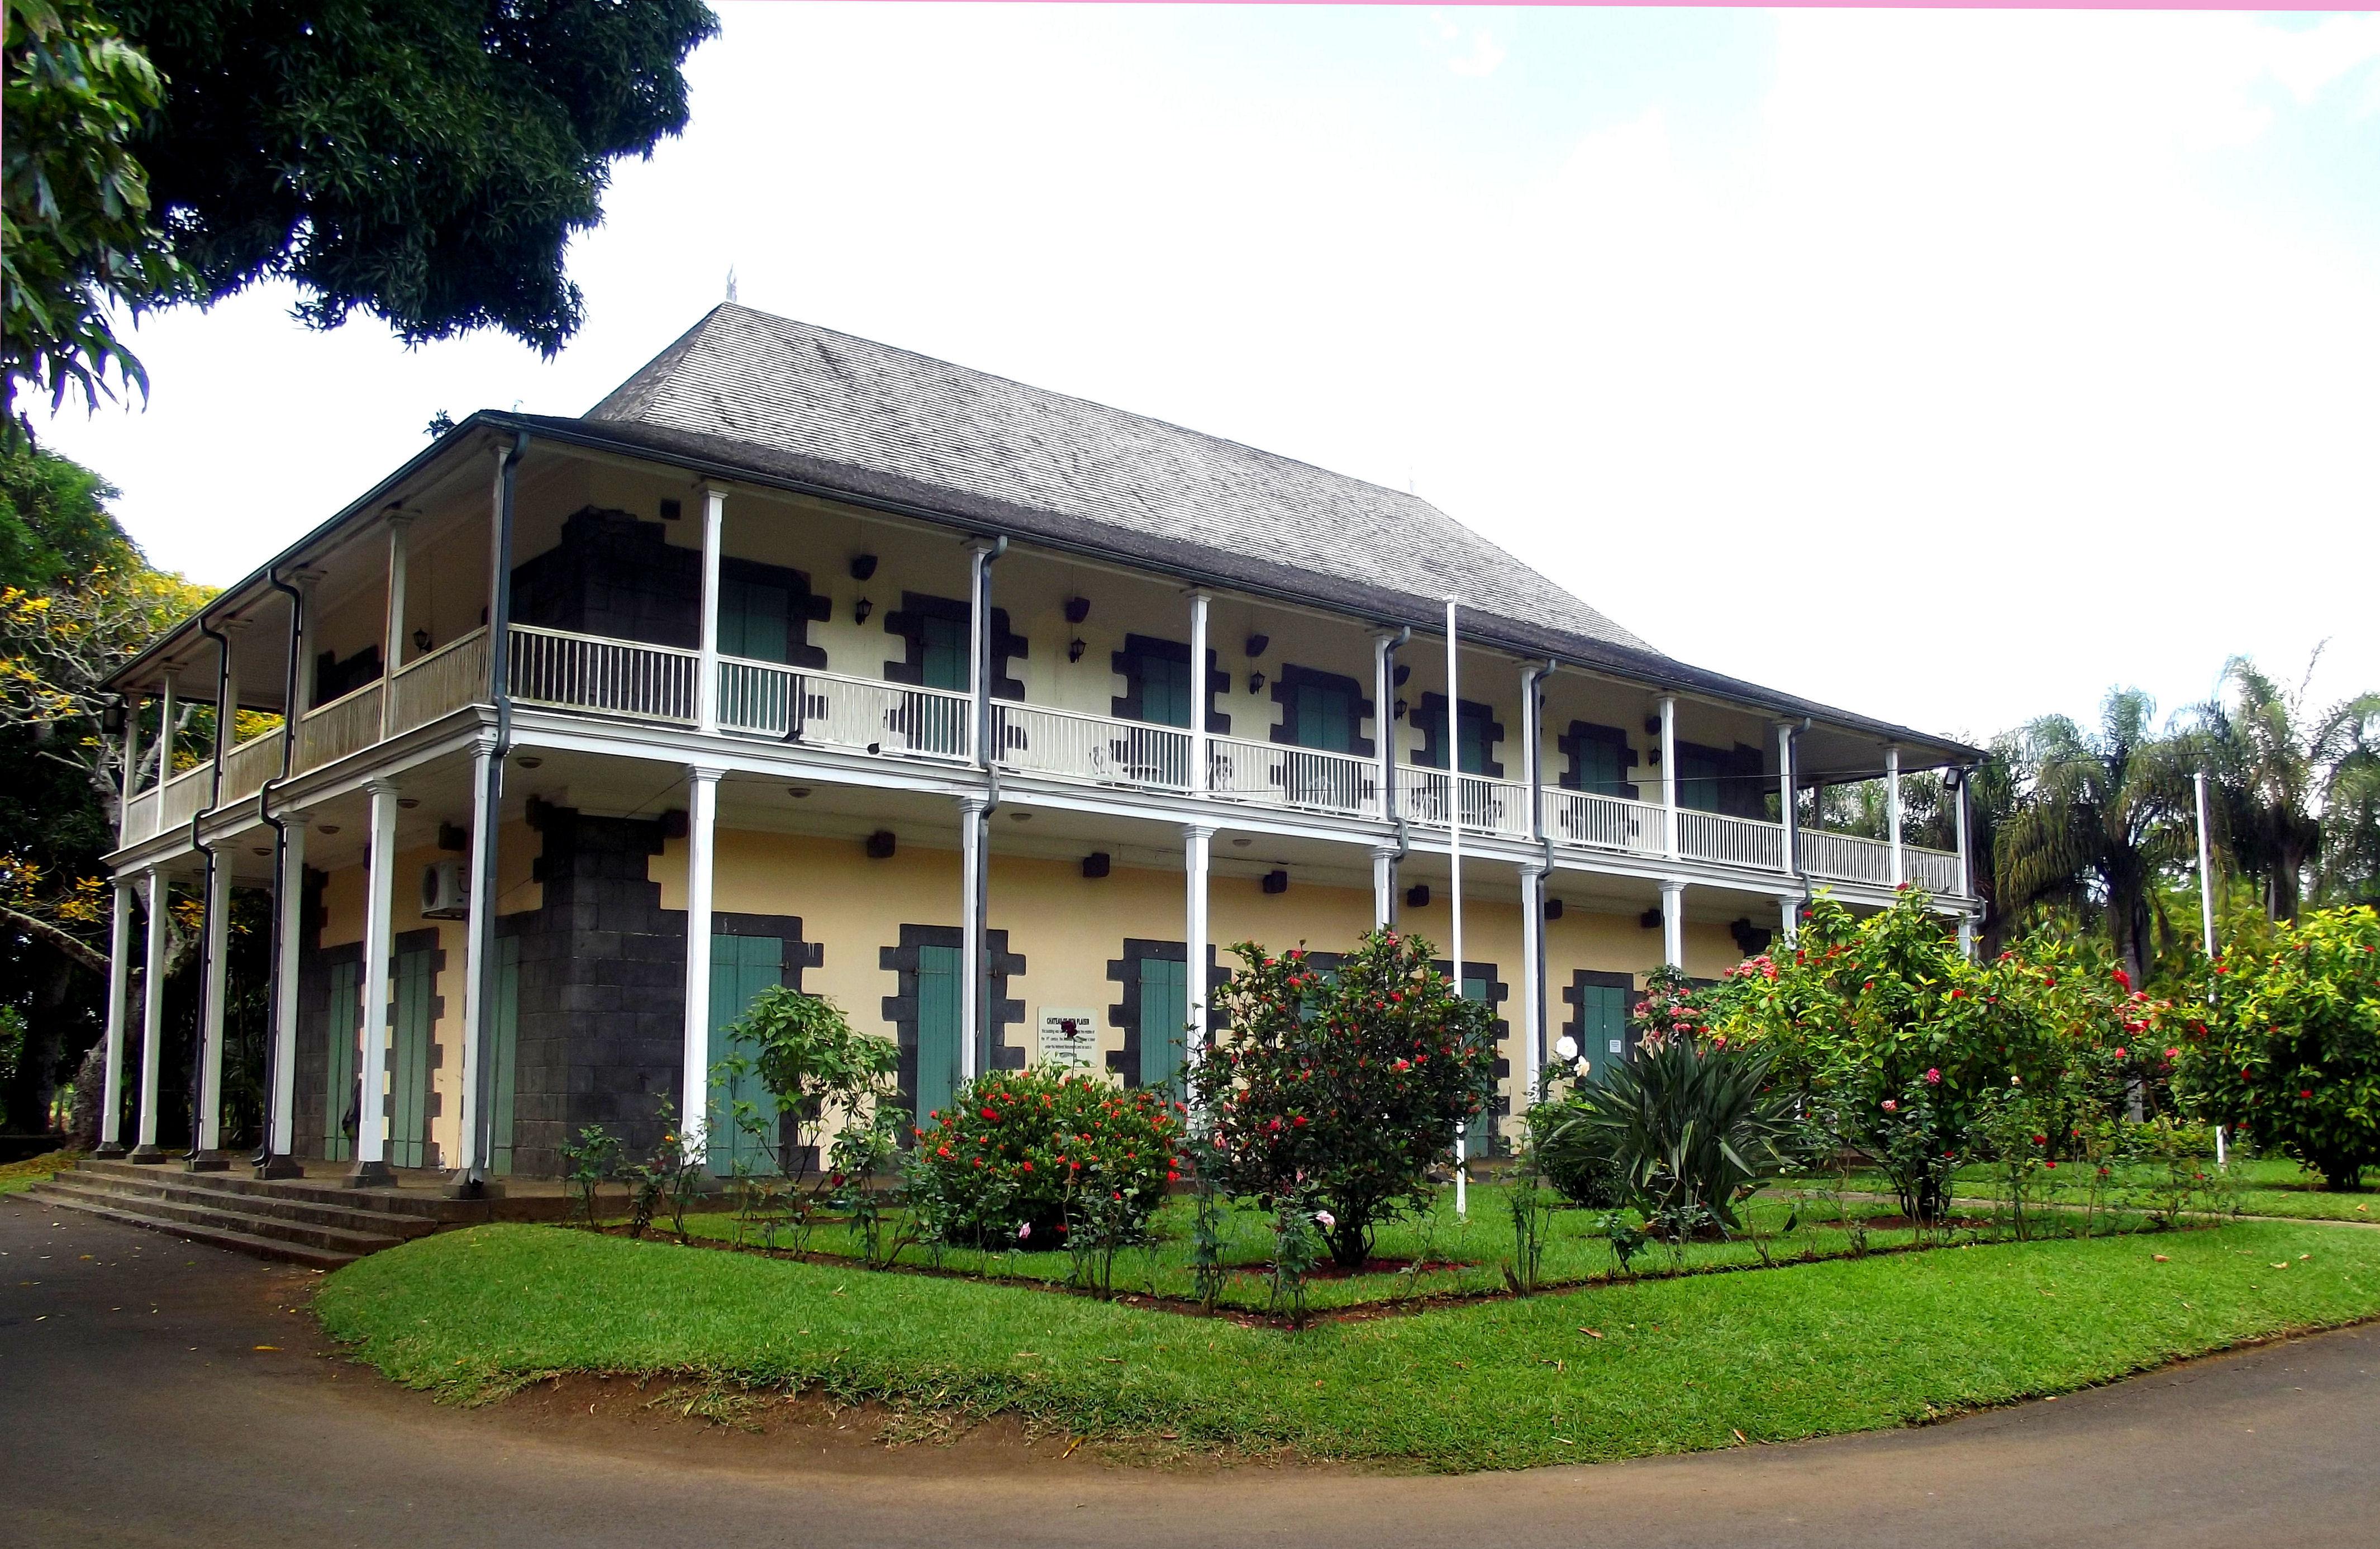 Backyard of Eureka house